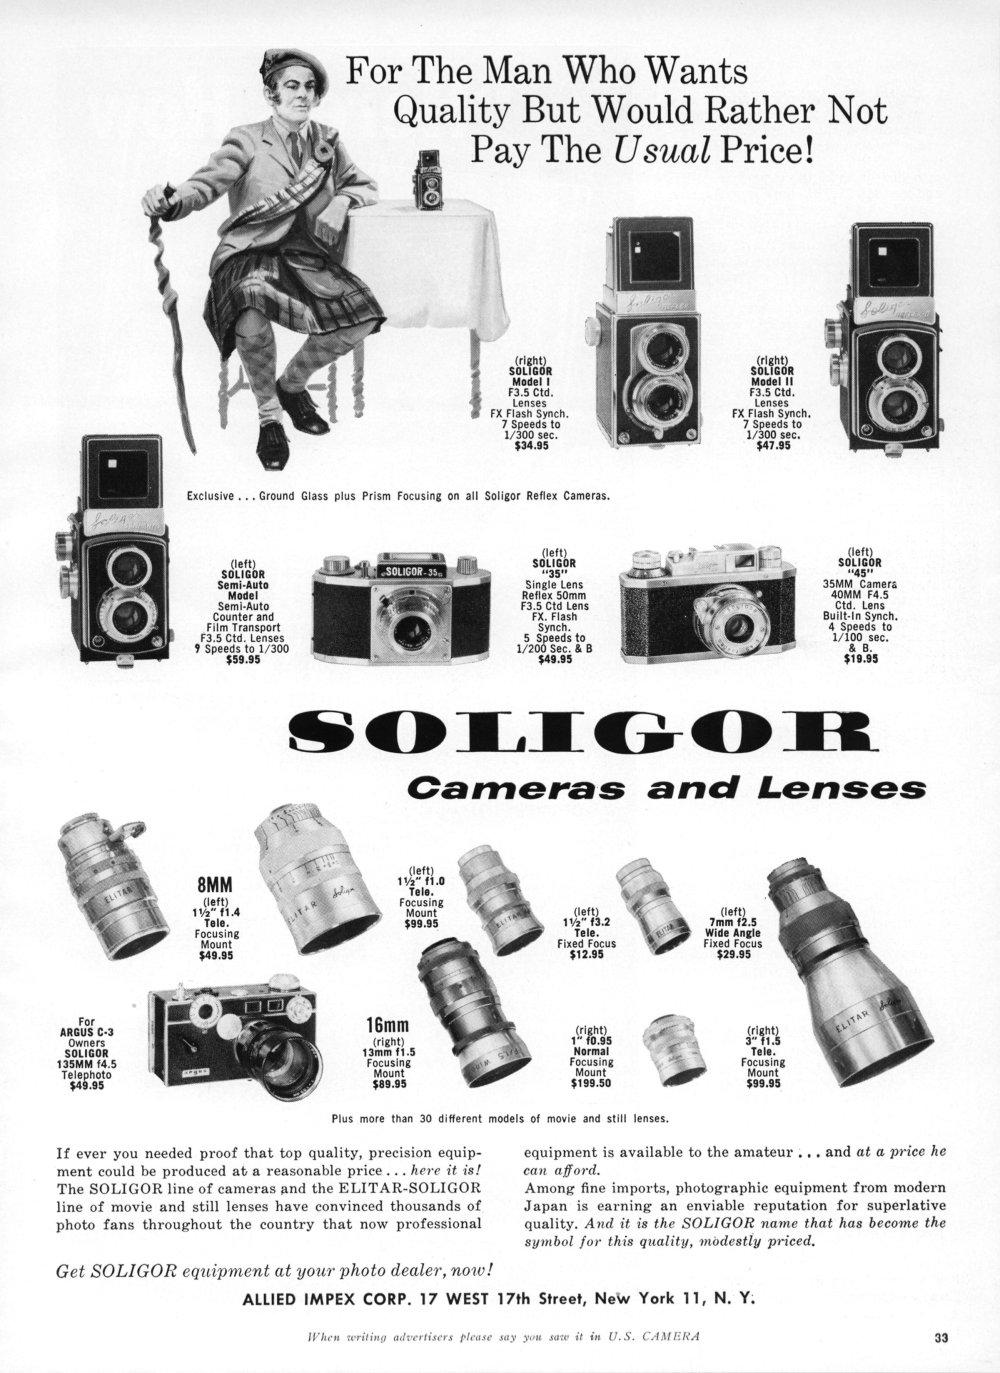 Elitar Soligor 25mm f0.95